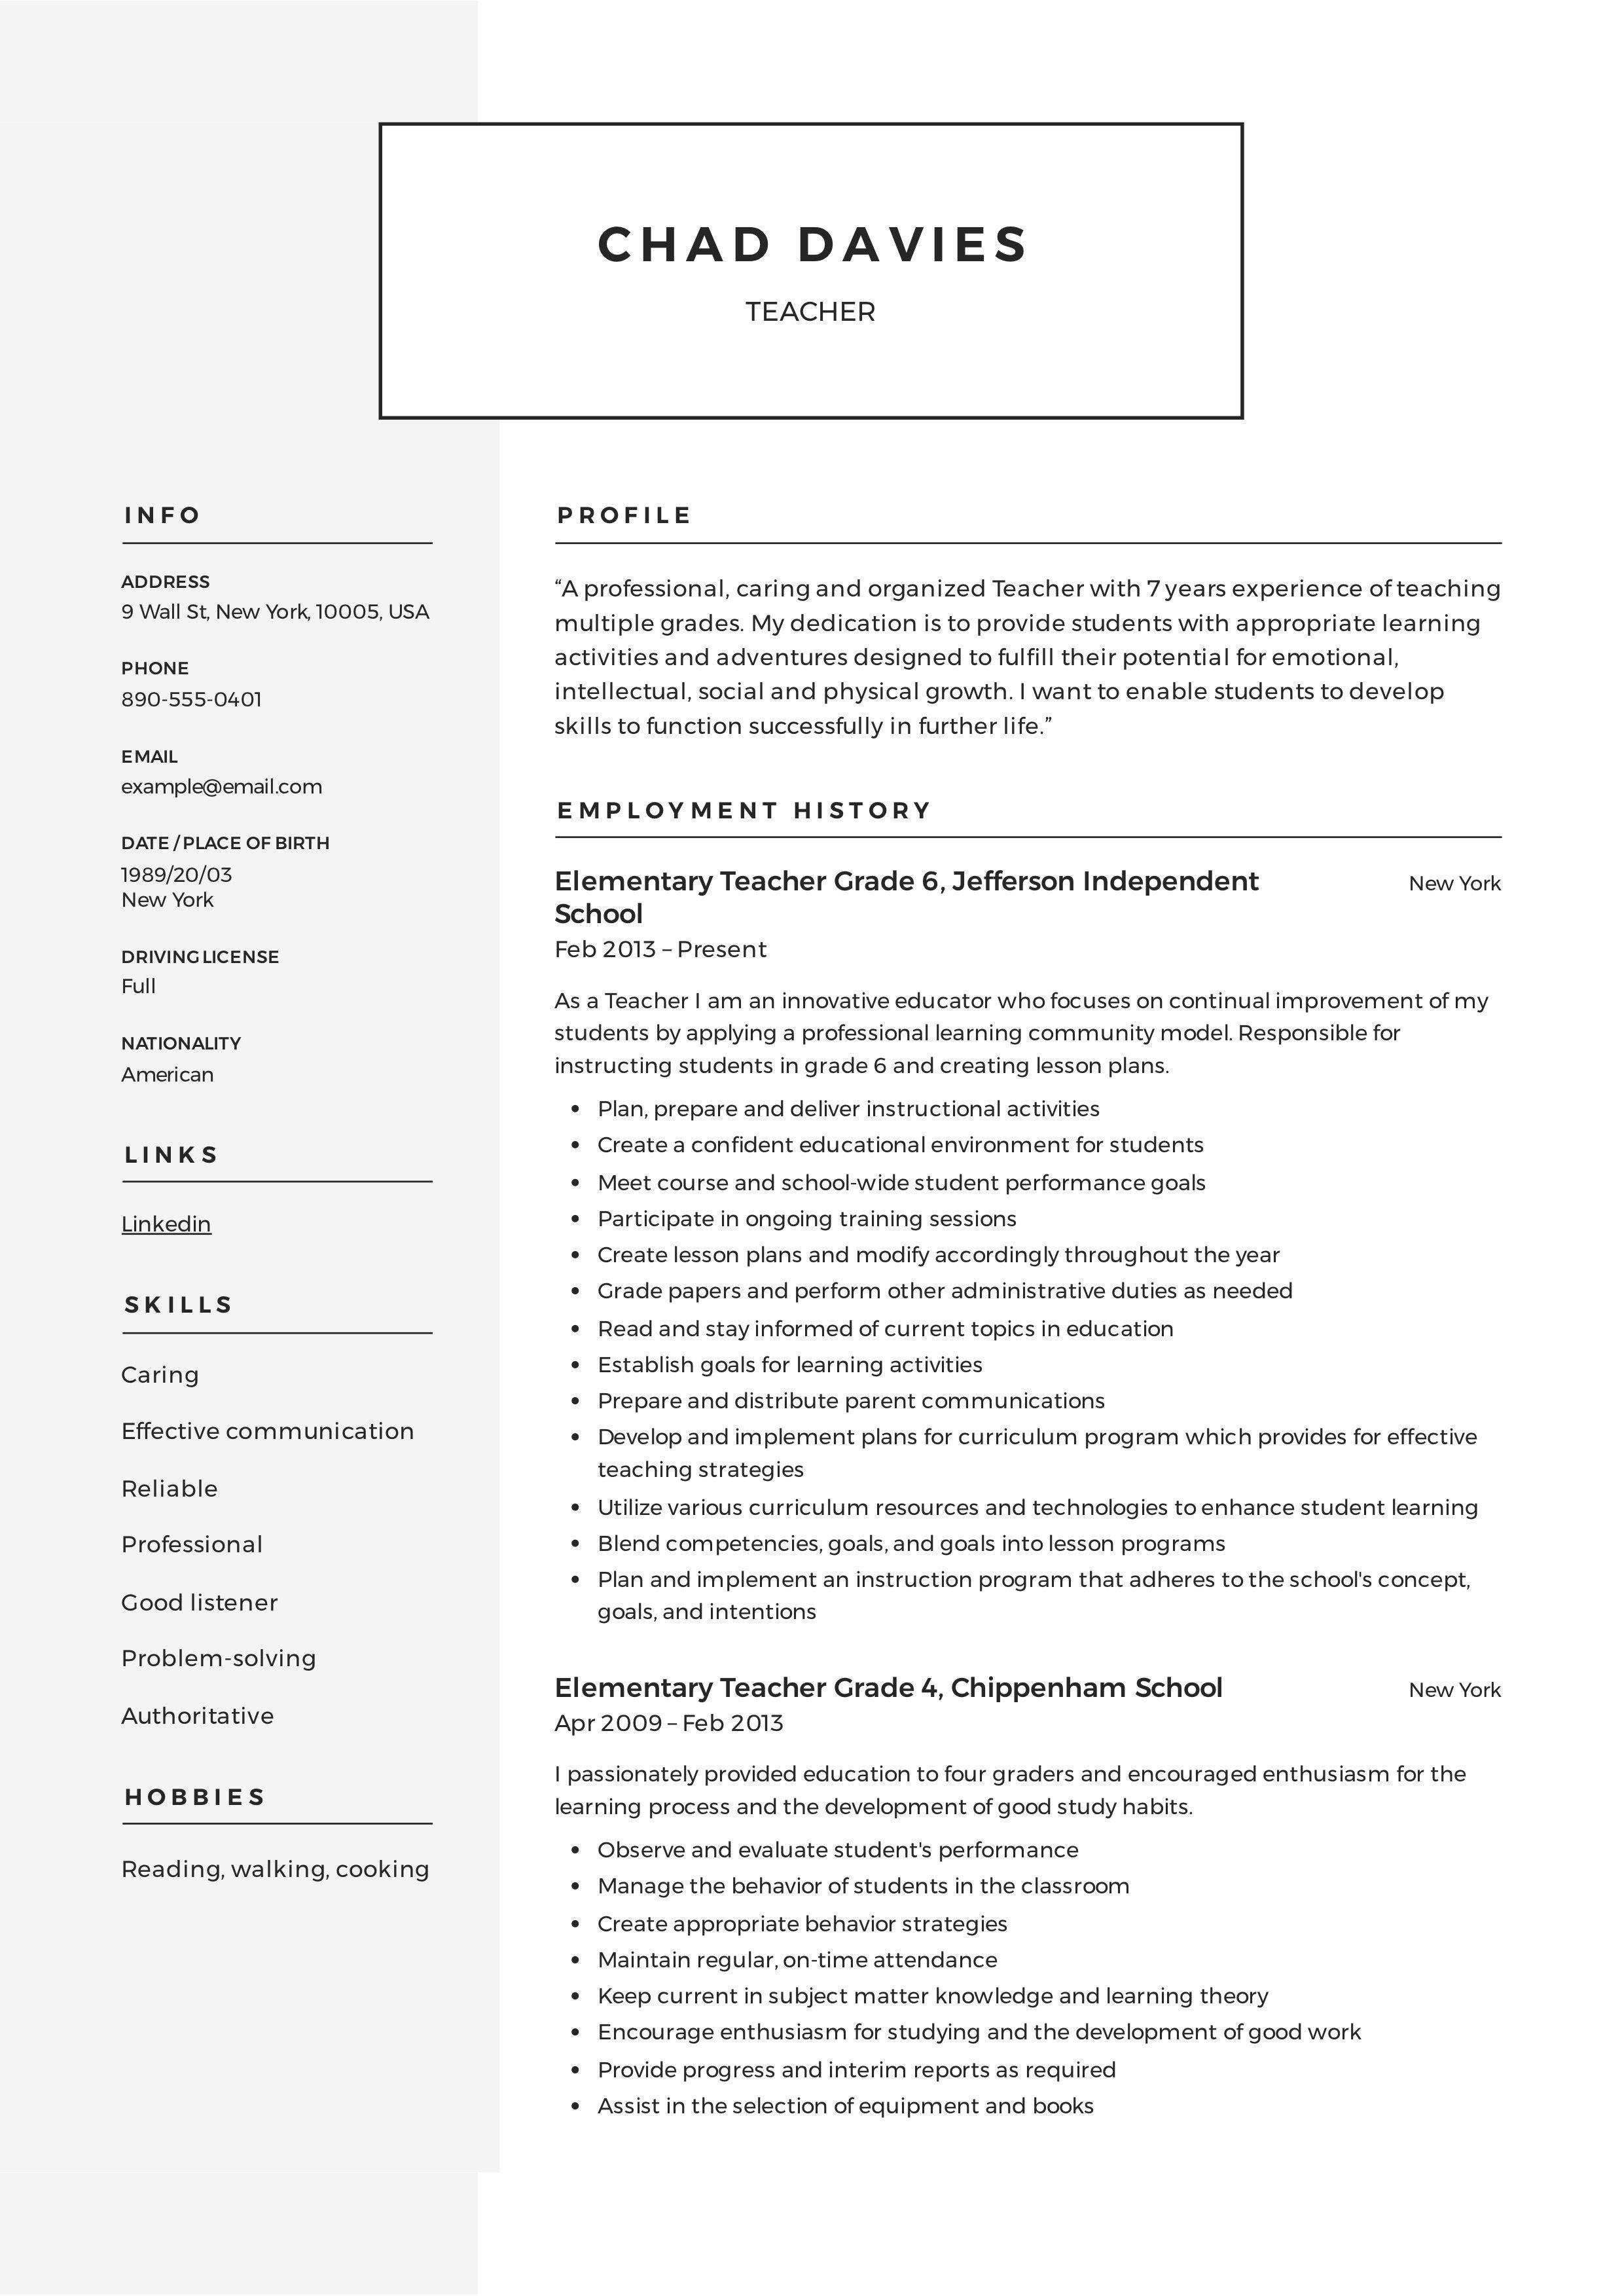 006 Outstanding Resume Sample For Teaching Position Highest Clarity  Teacher Aide In CollegeFull